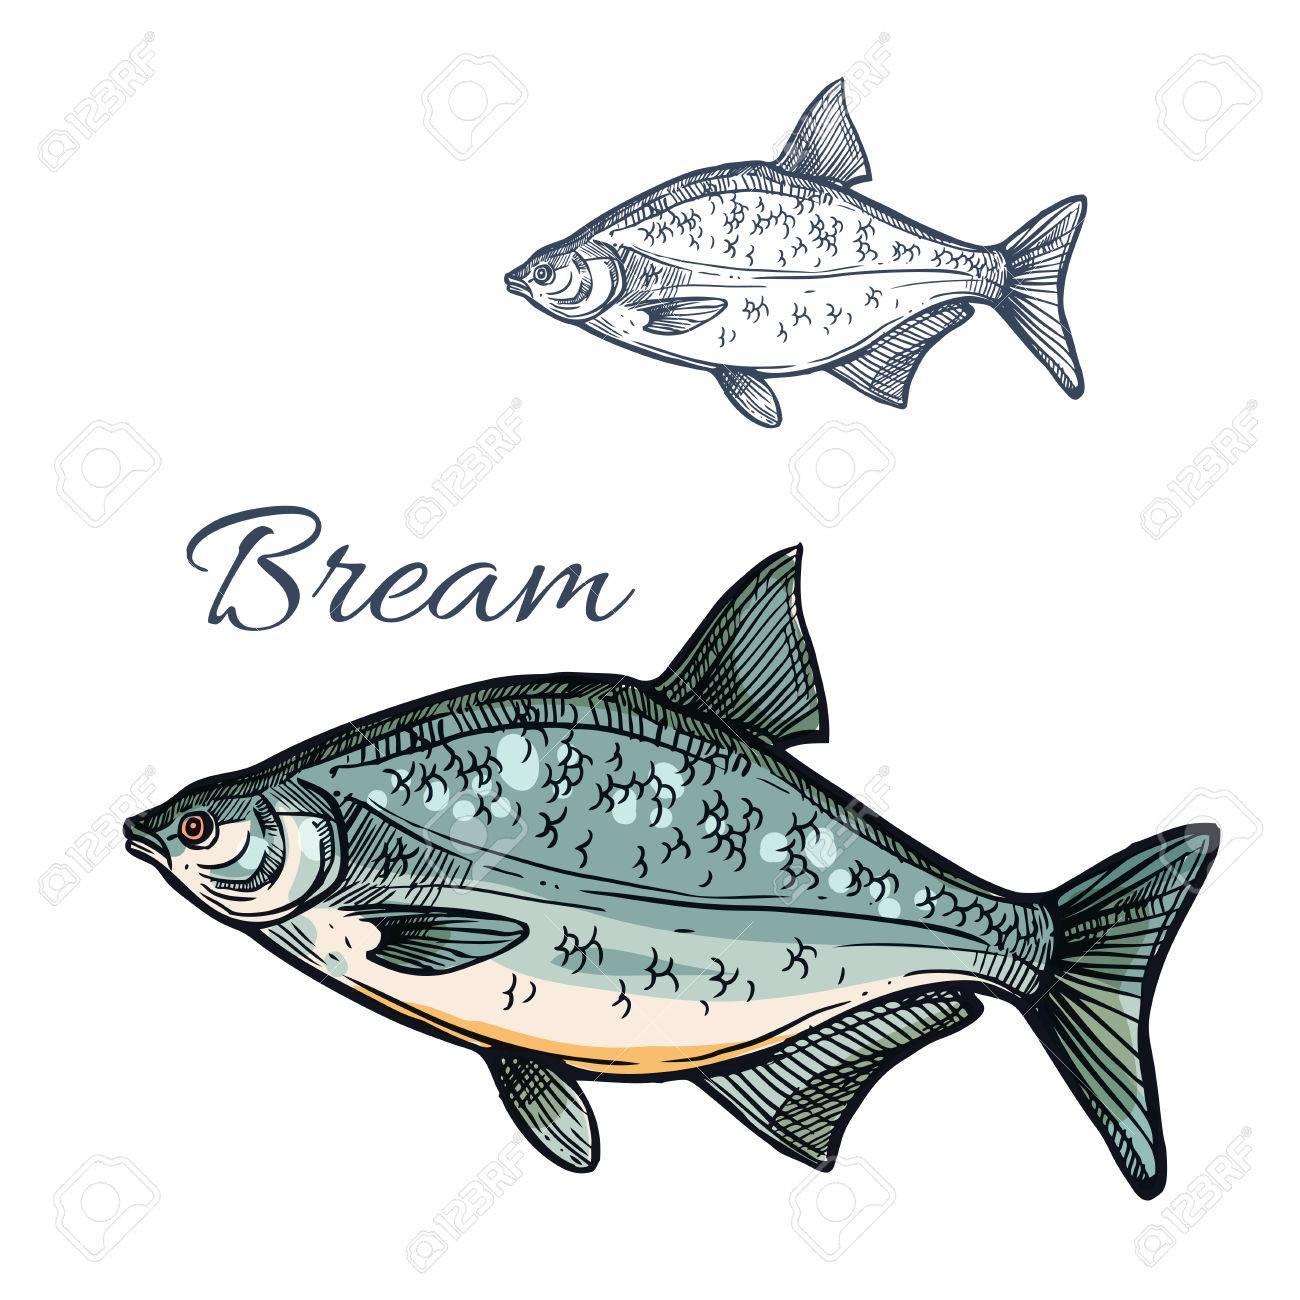 Bream sketch fish freshwater marine fish species of sea porgy or freshwater marine fish species of sea porgy or pomfret isolated symbol biocorpaavc Choice Image